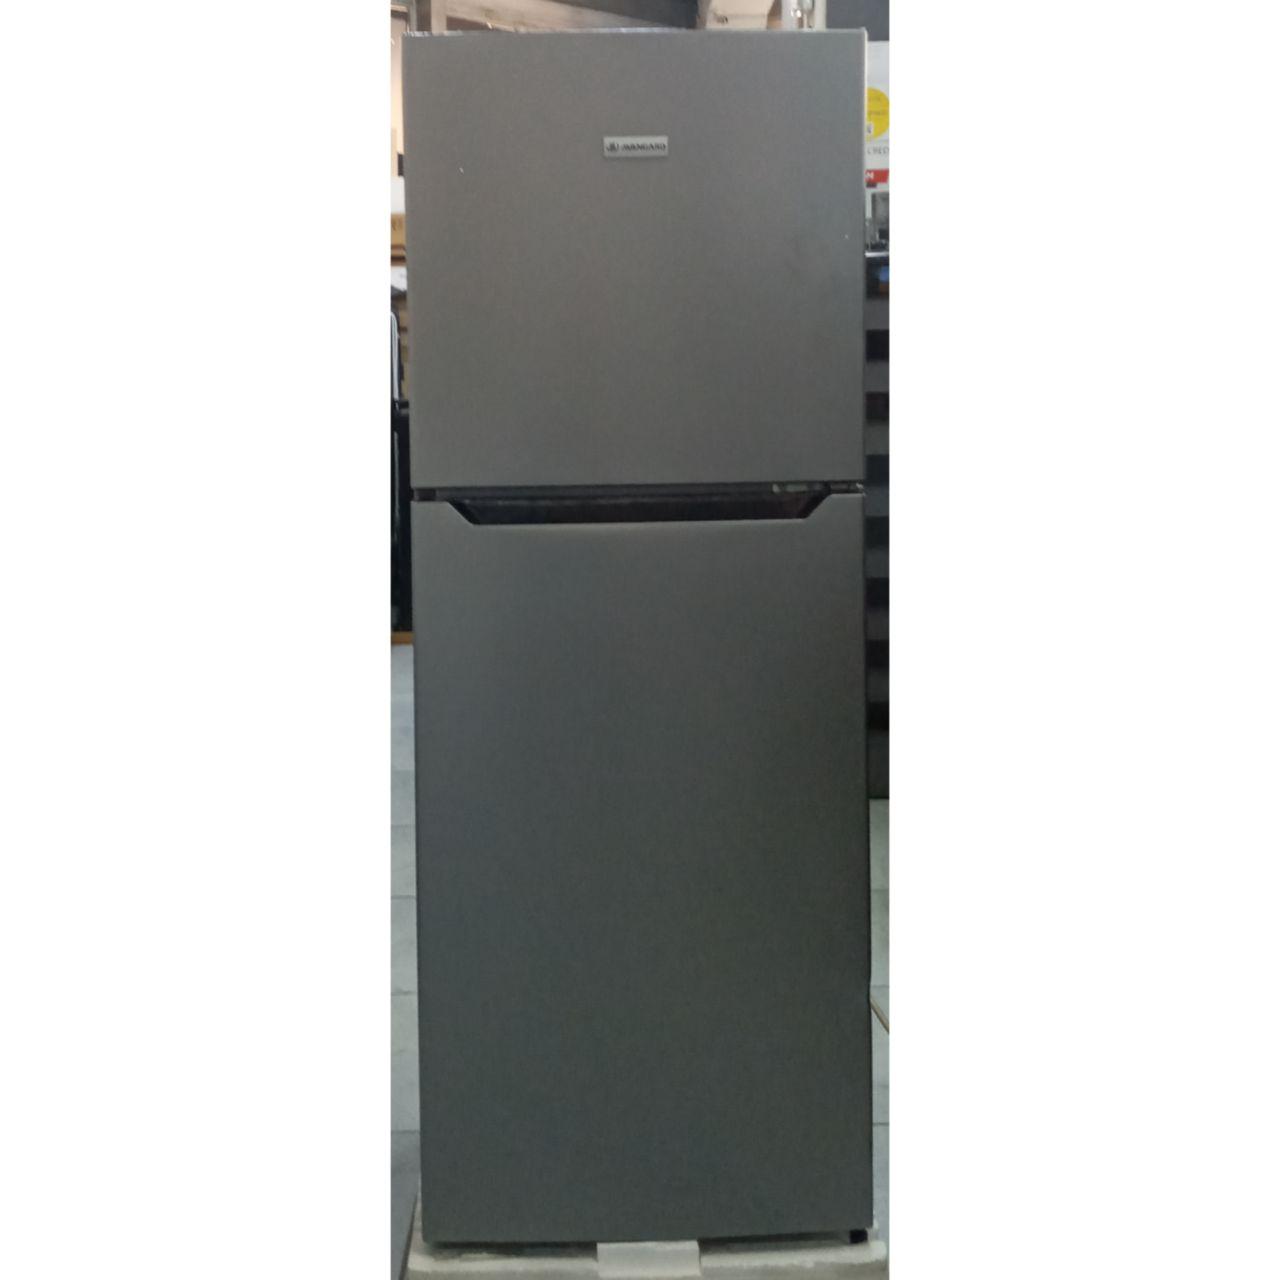 Холодильник двухкамерный Avangard 142 литра